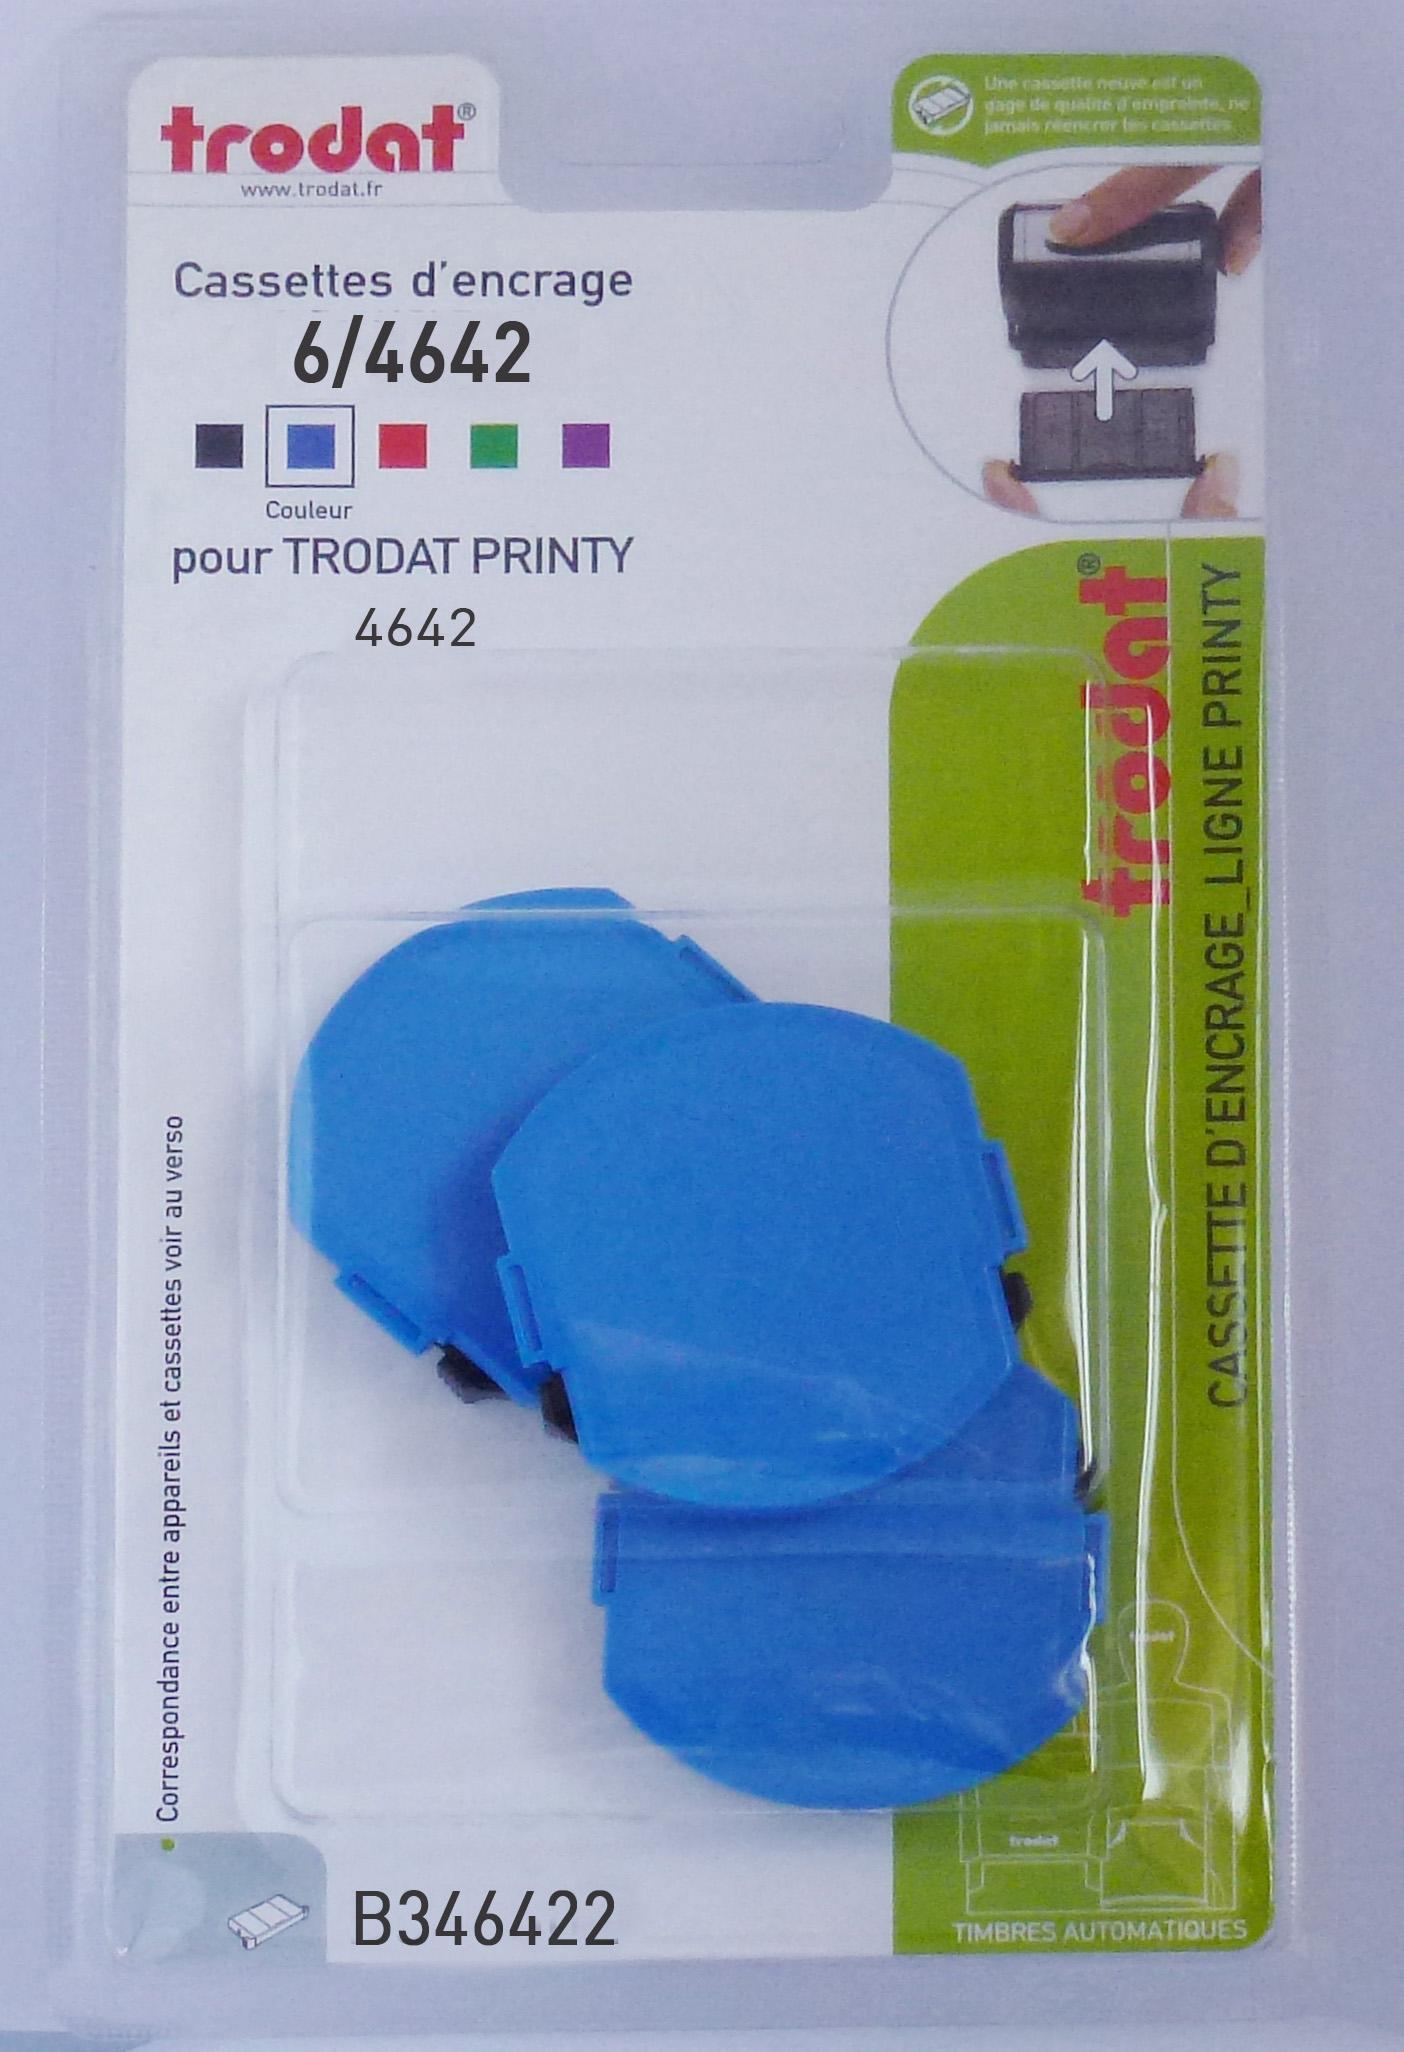 Trodat - 3 Encriers 6/4642 recharges pour tampon Printy 4642 - bleu